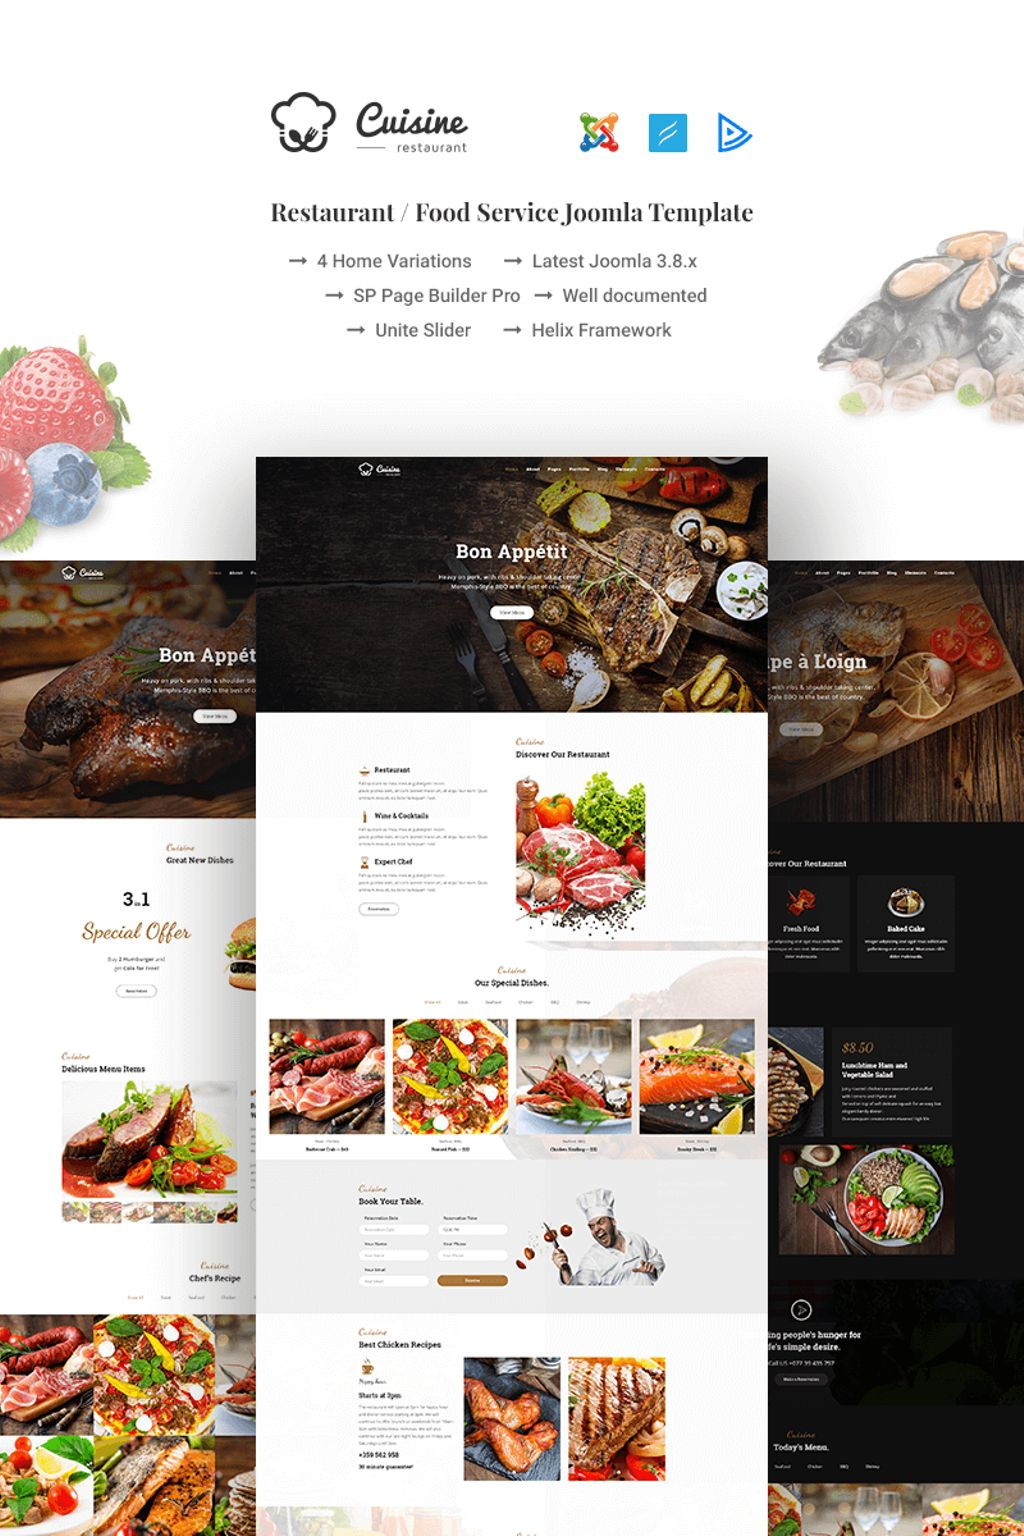 Cuisine - Restaurant / Food Service Joomla Template